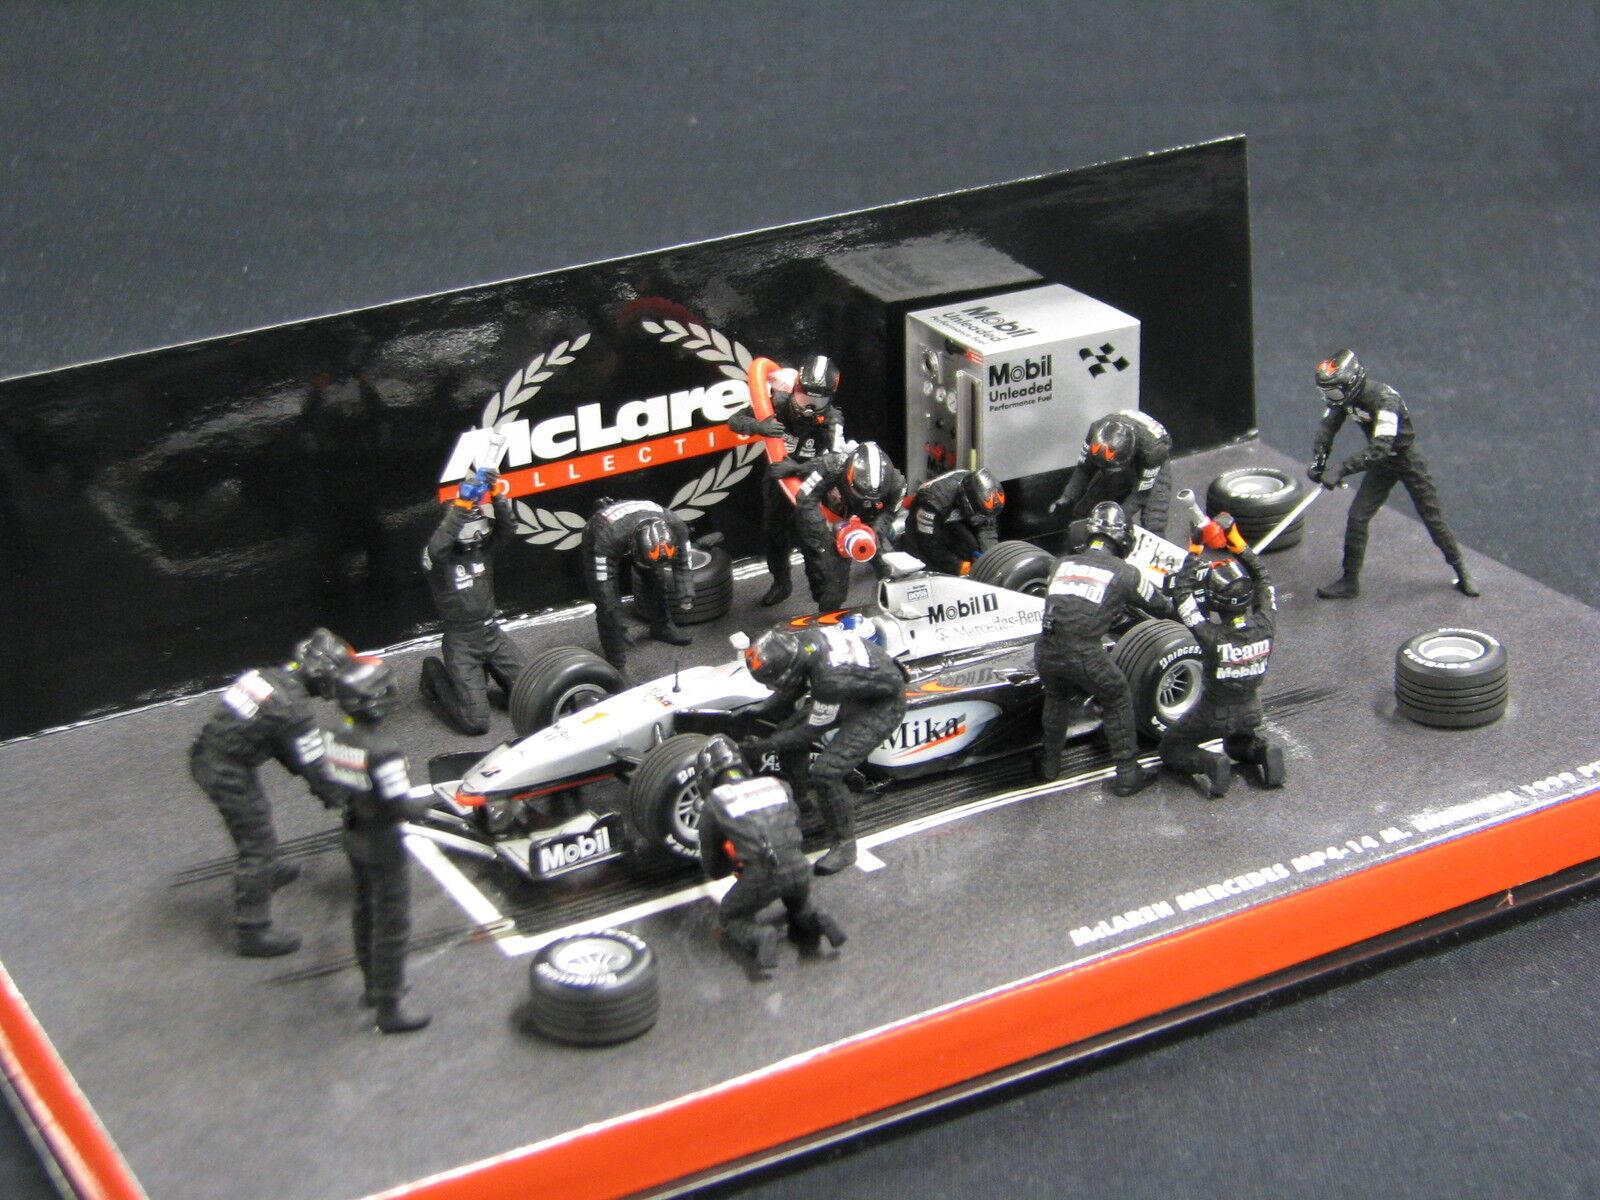 Minichamps McLaren Mercedes Mercedes MP4 14 1999 1 43  1 Mika Hakkinen Pit (JS)